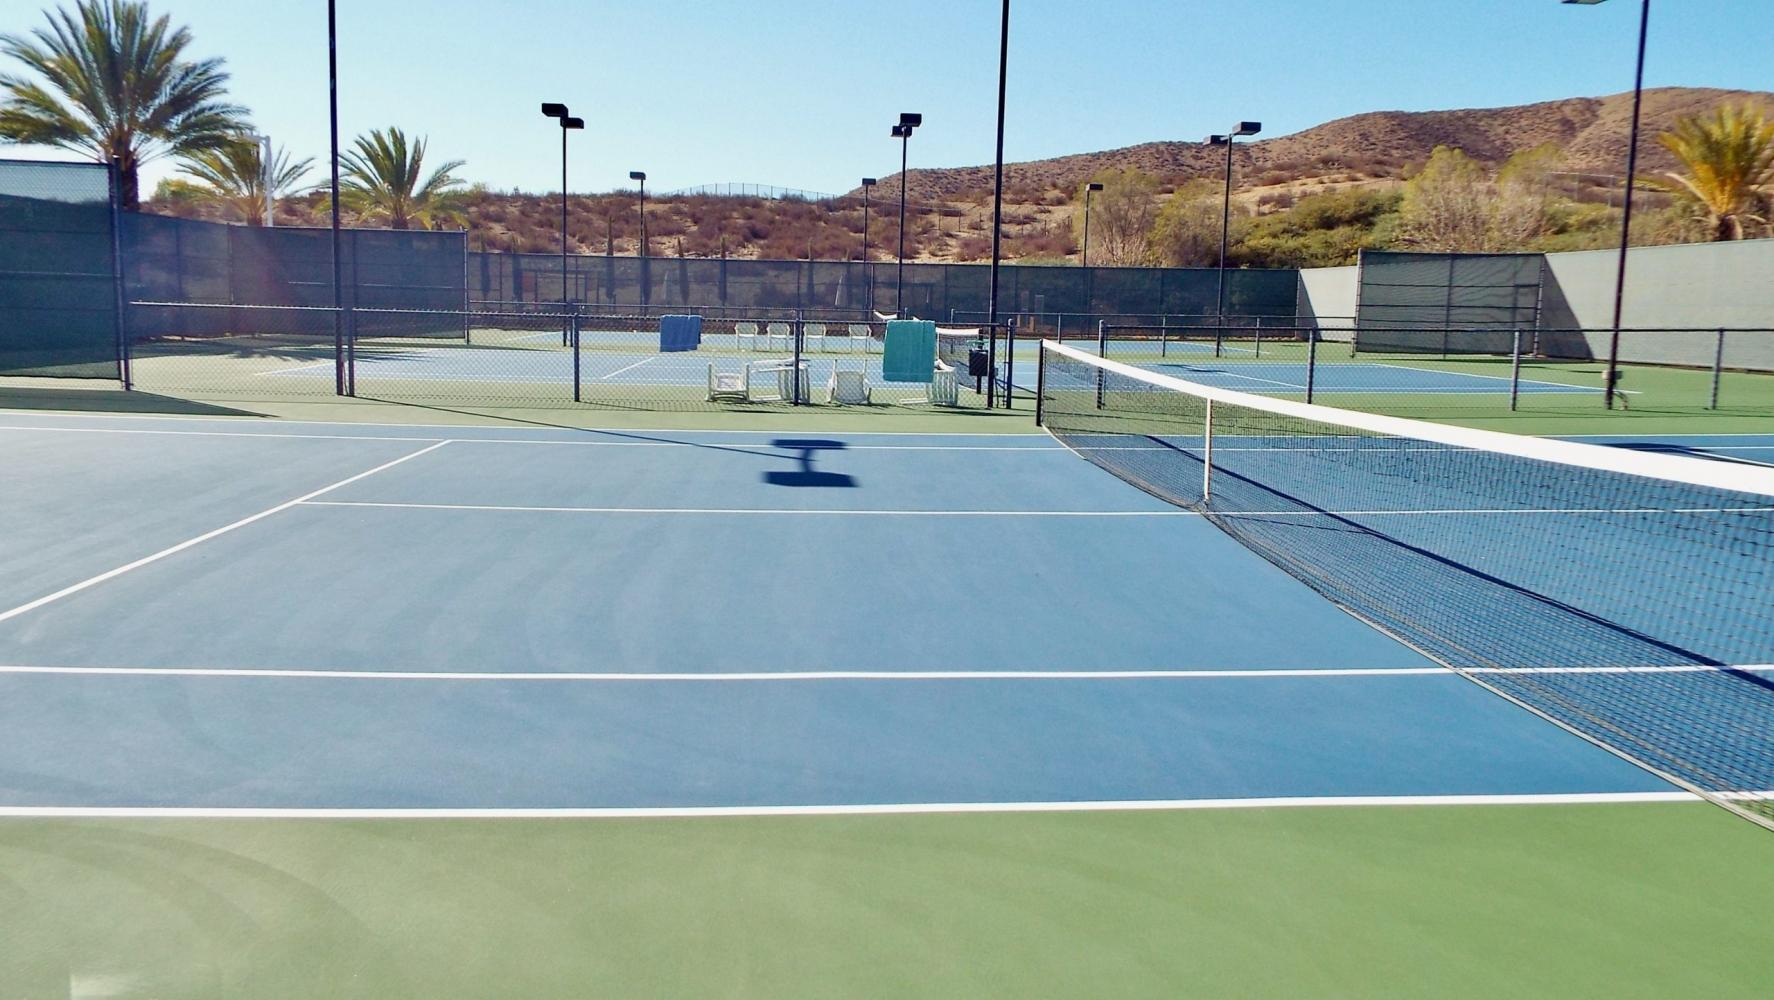 Menifee Oasis - Tennis Courts